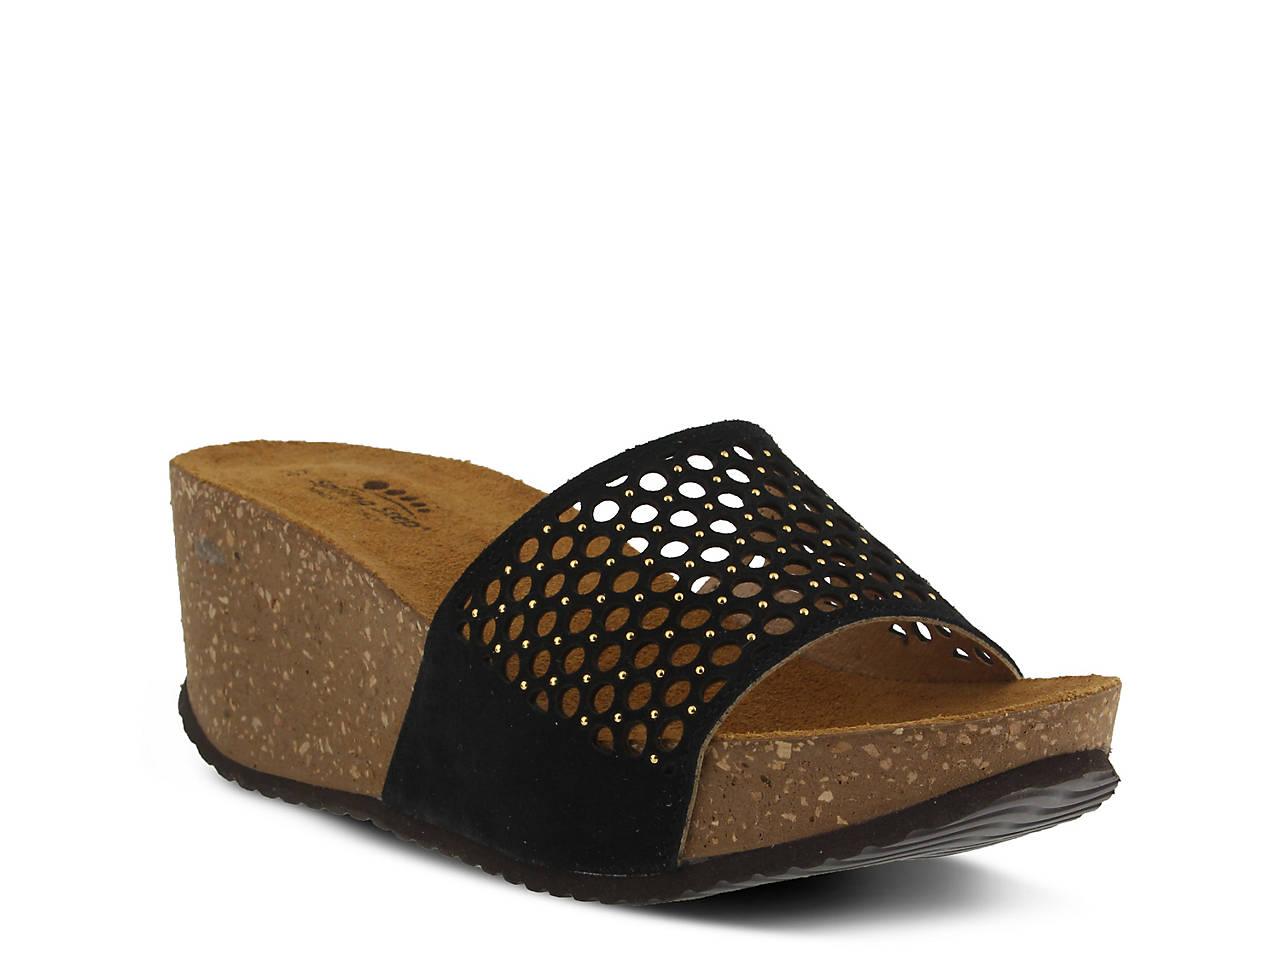 Marni Slingback wedge sandals 5igpfv